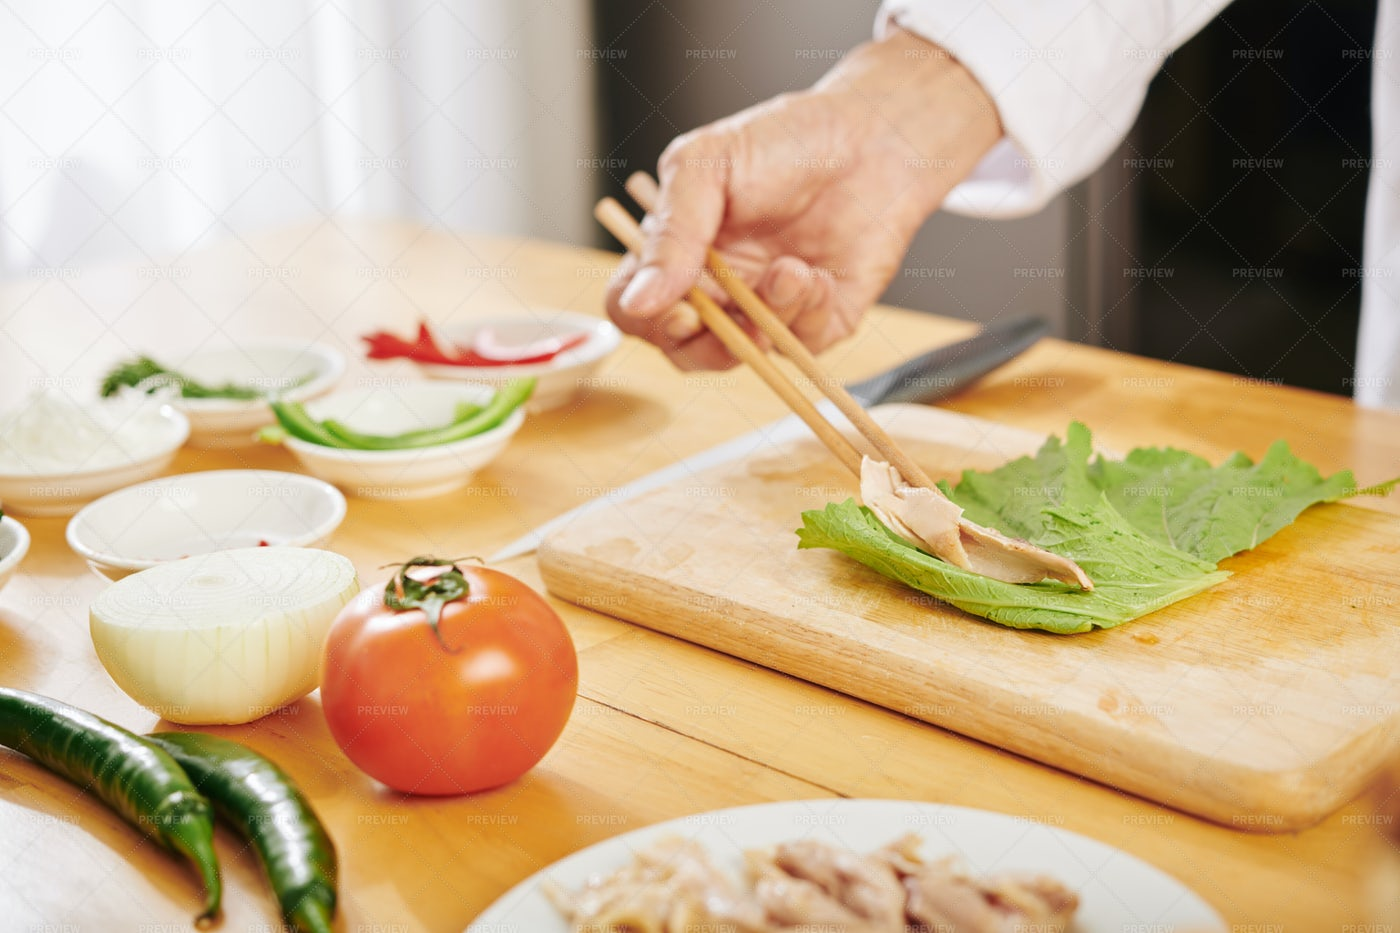 Cook Making Chiken Roll: Stock Photos